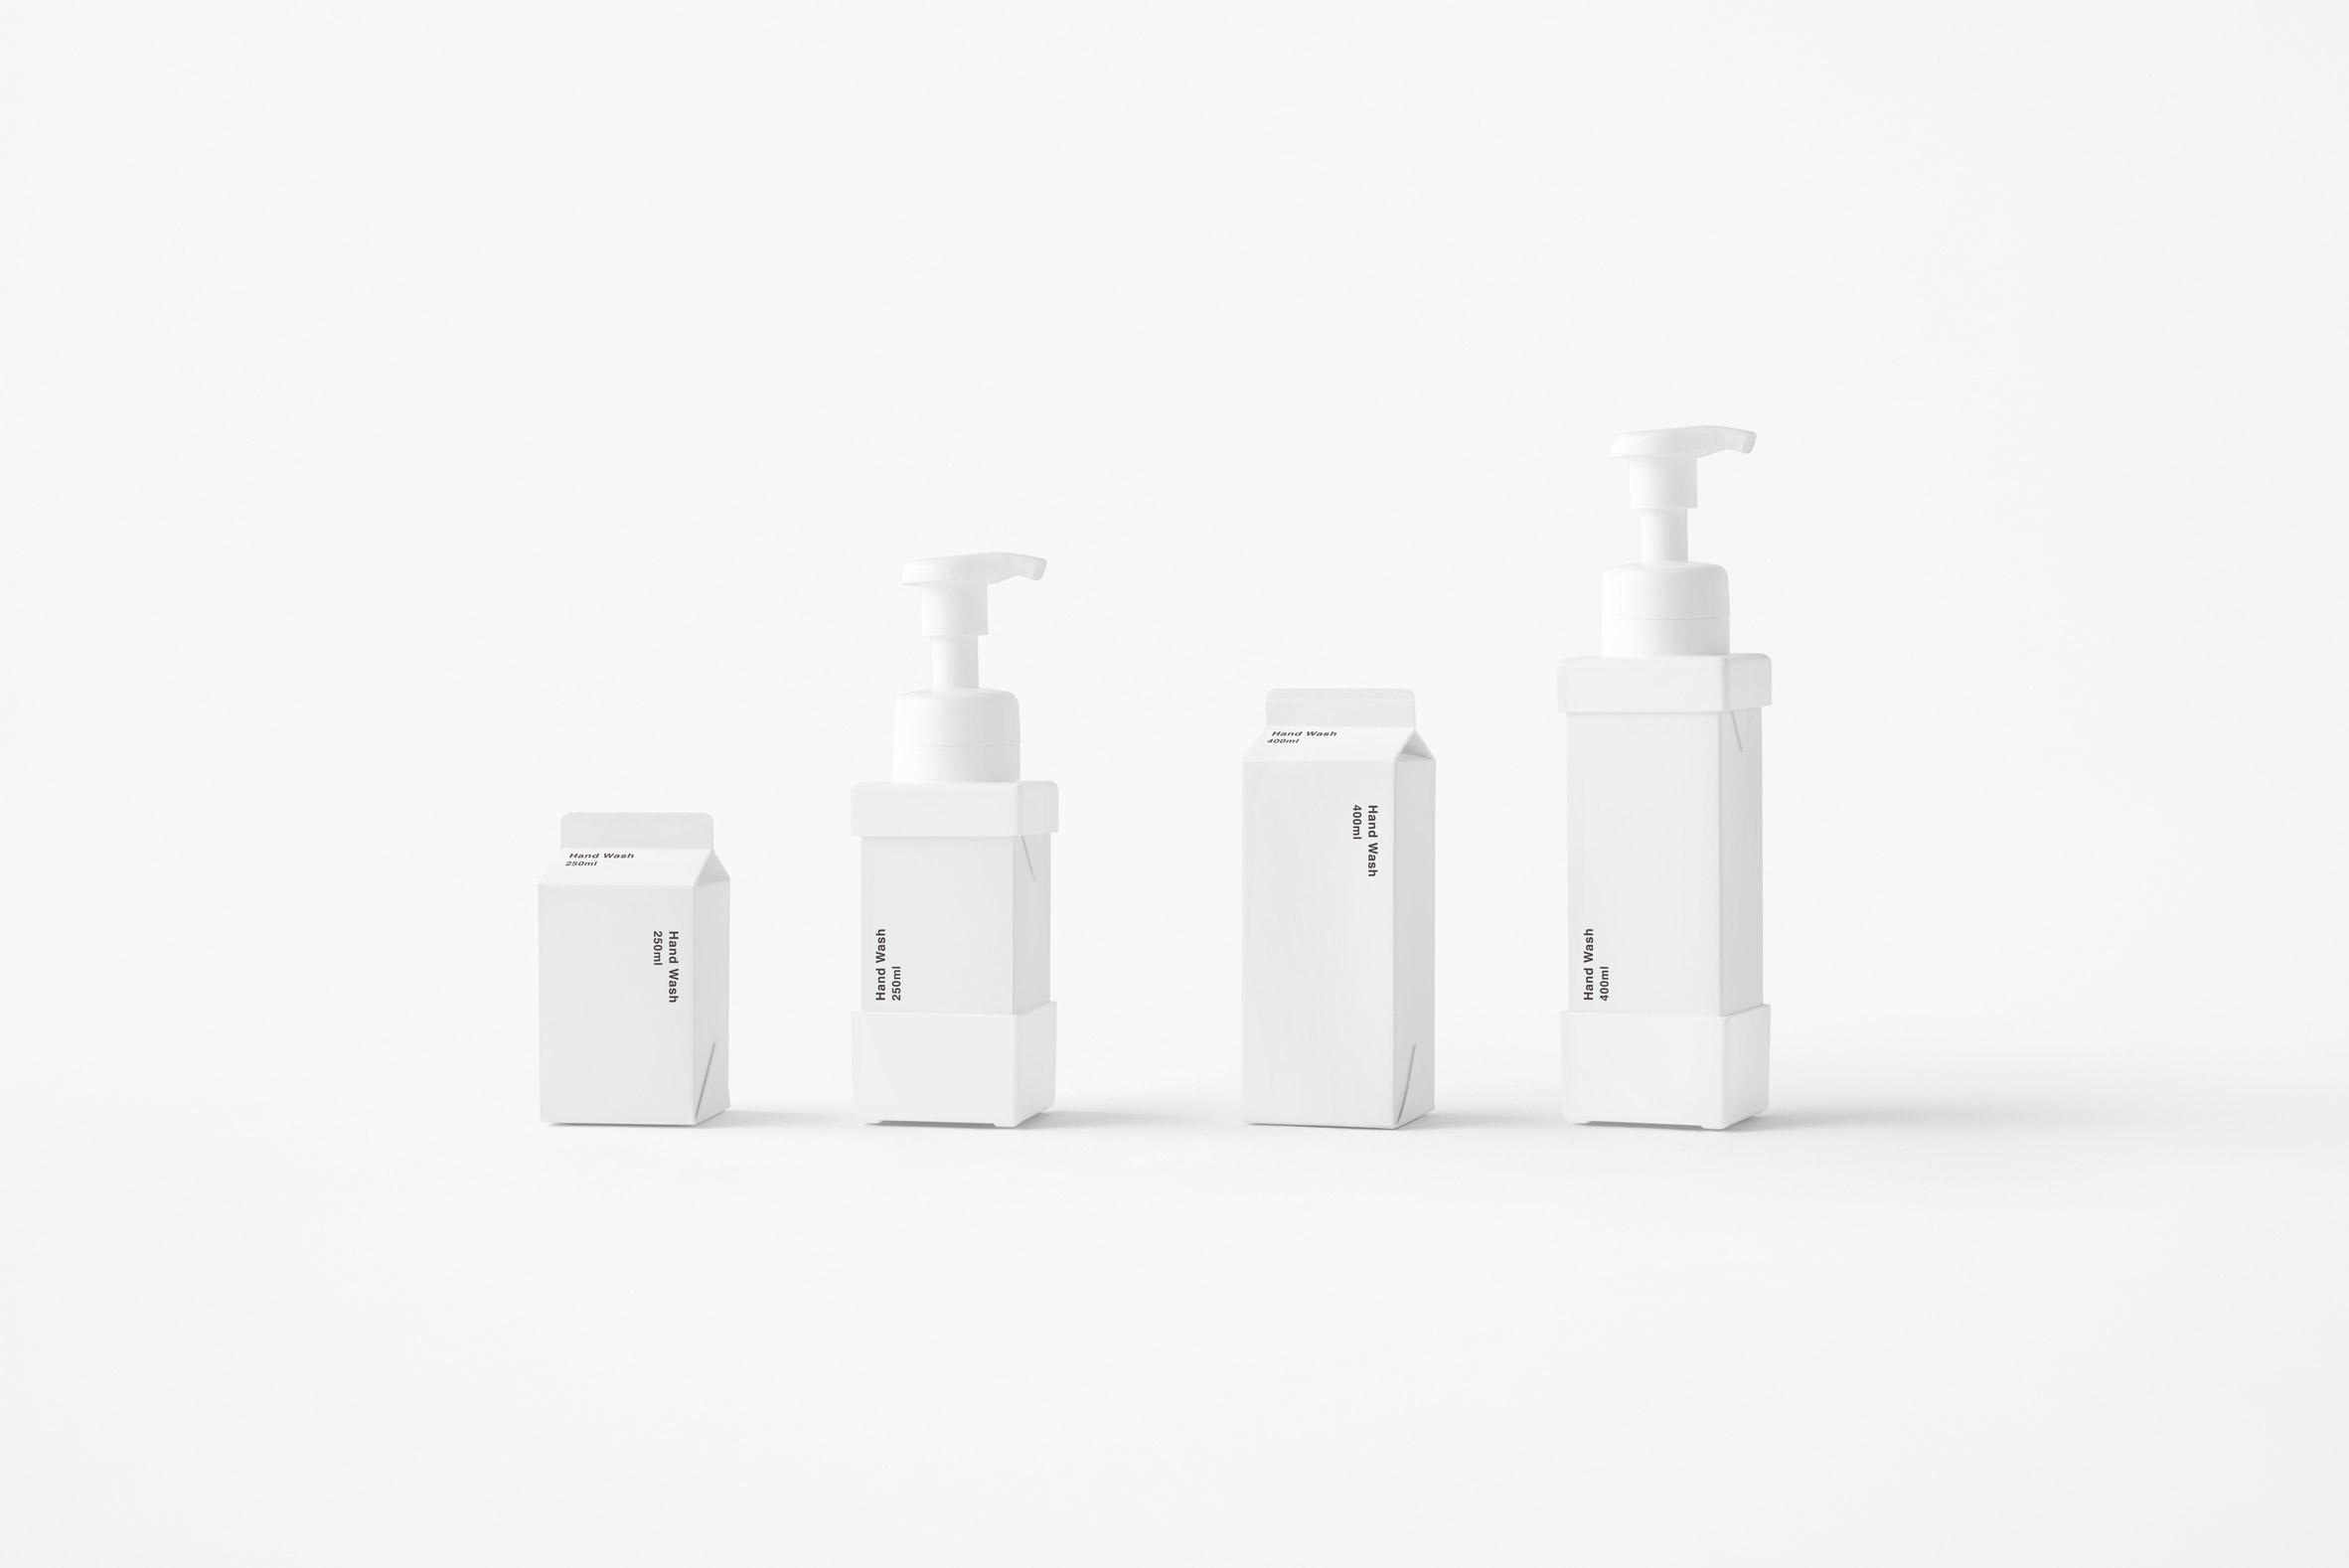 Nendo announces replaceable soap dispensers that look like milk cartons